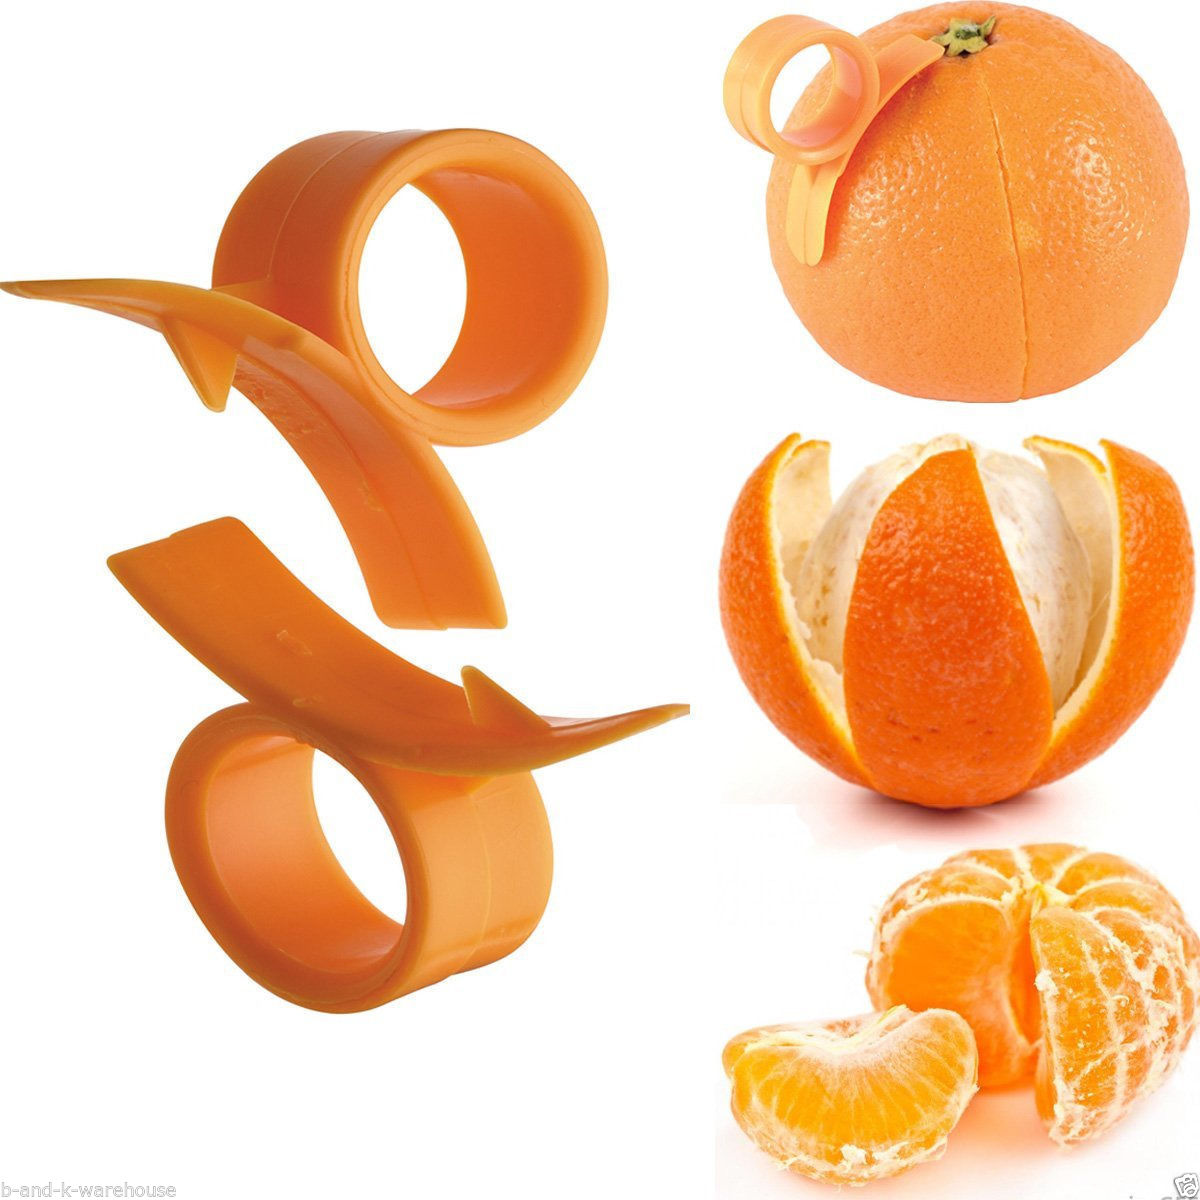 Kabalo Orange Peelers 2pc set - Finger Held Grapefruit Lemon Orange Peeler Citrus Peel Opener Kitchen Tool